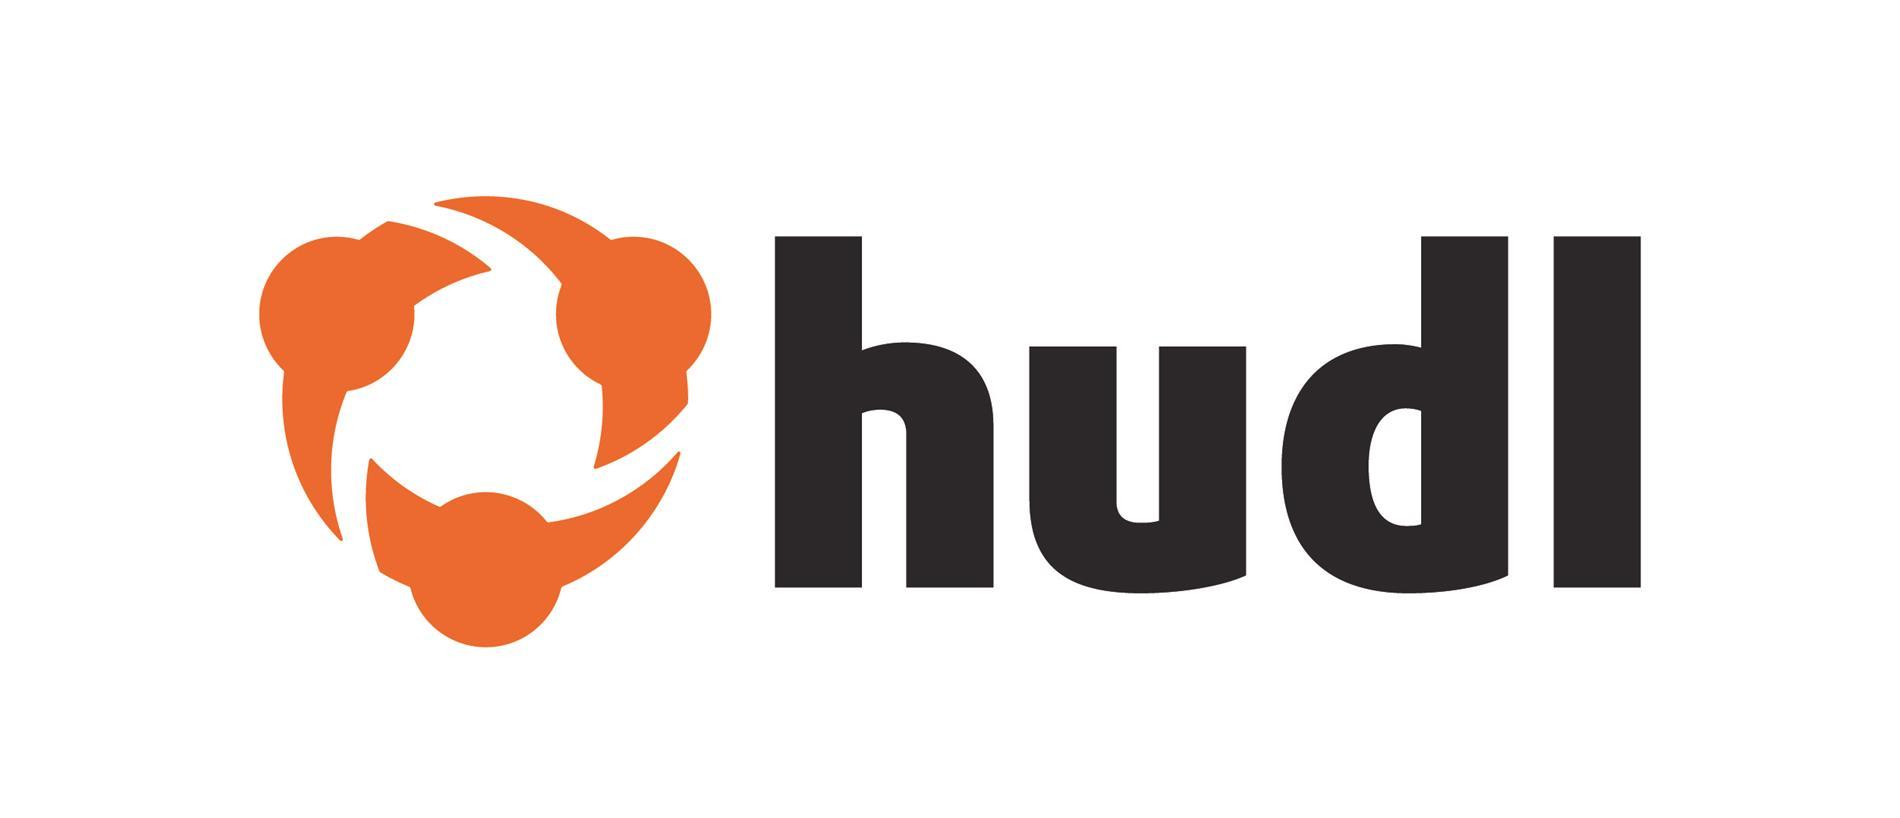 the Hudl logo